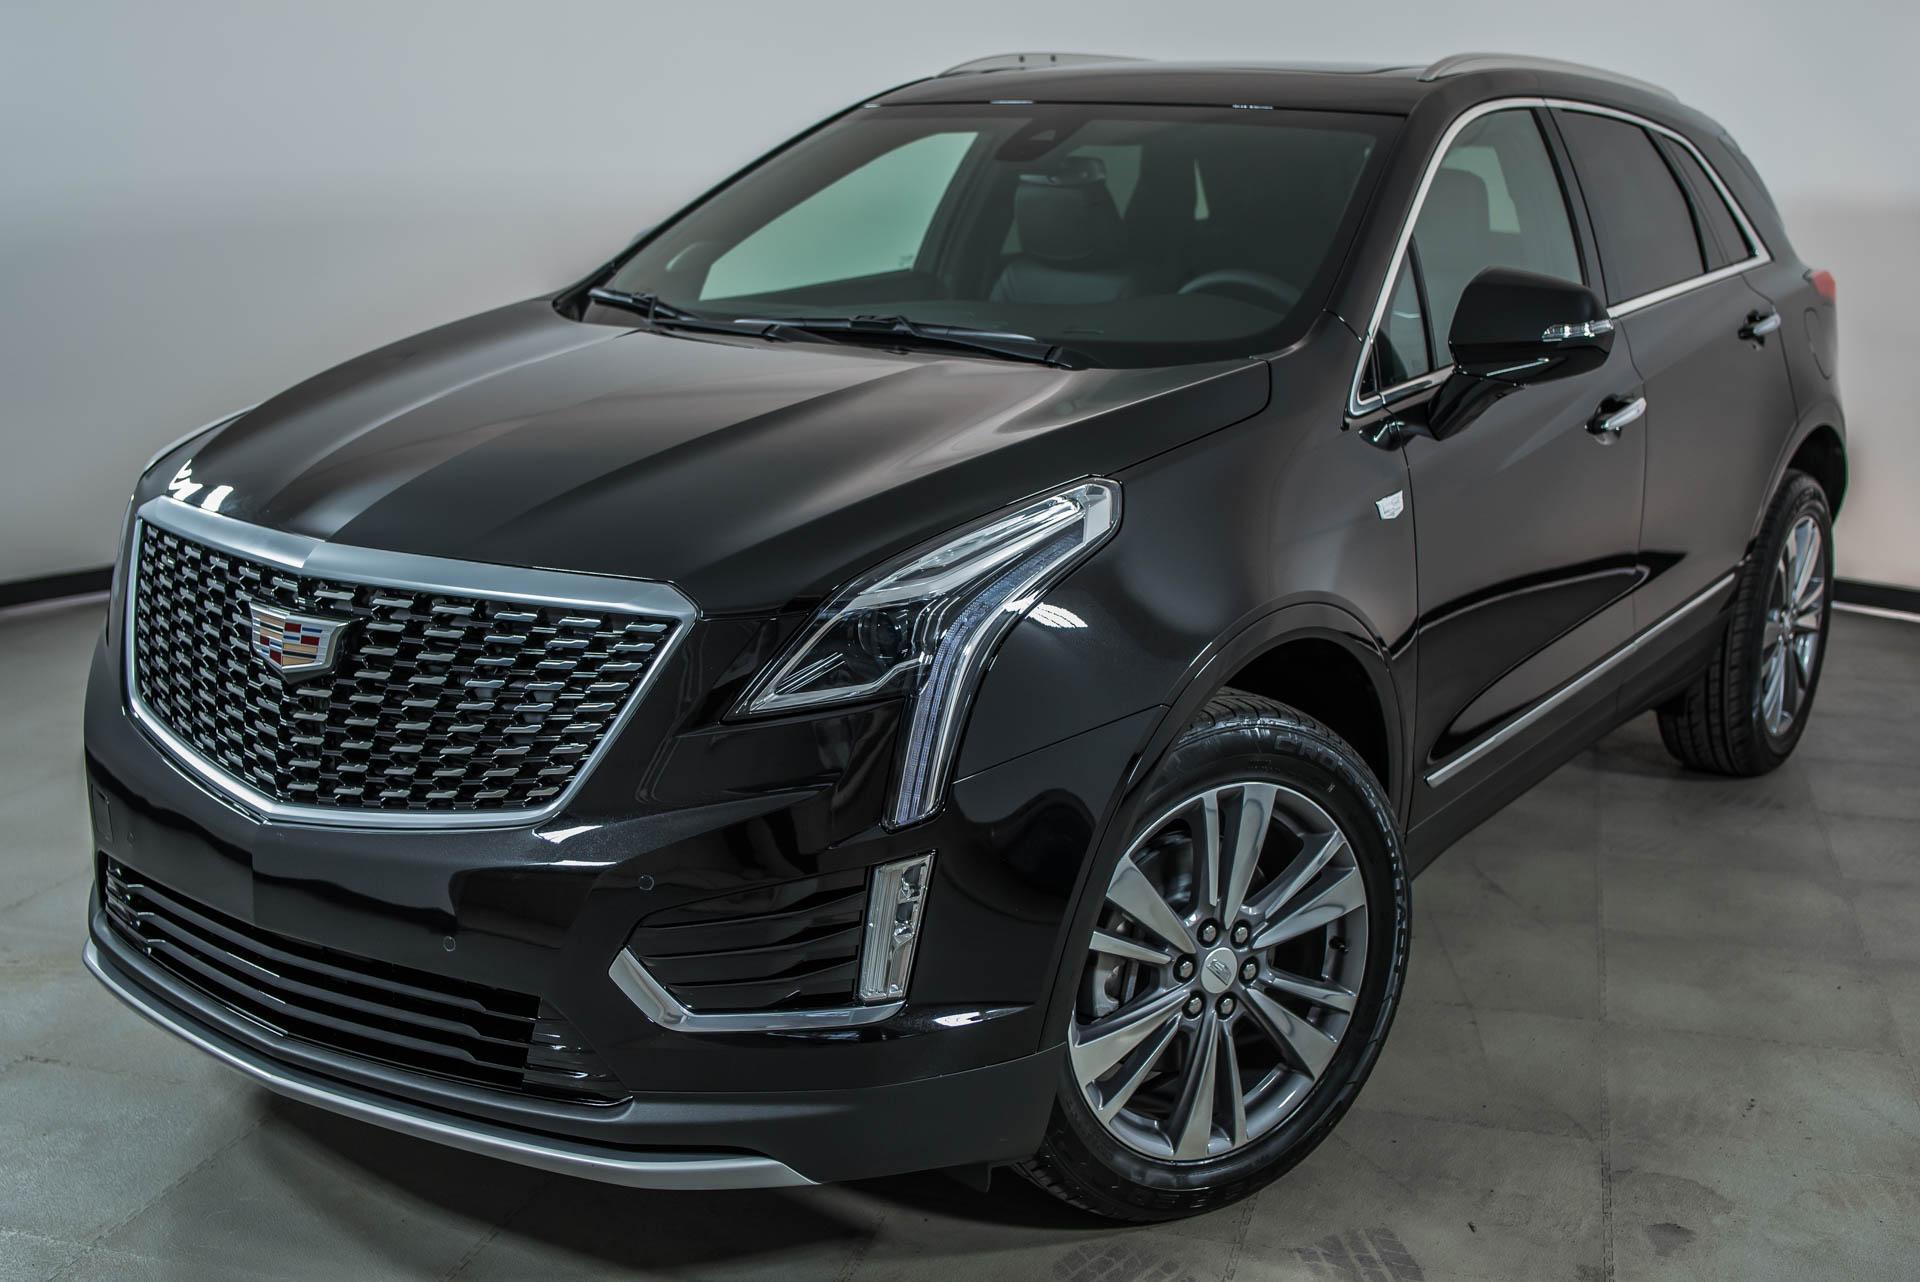 Cadillac Новый XT5 2.0 AT AWD (200 л.с.) Premium Luxury